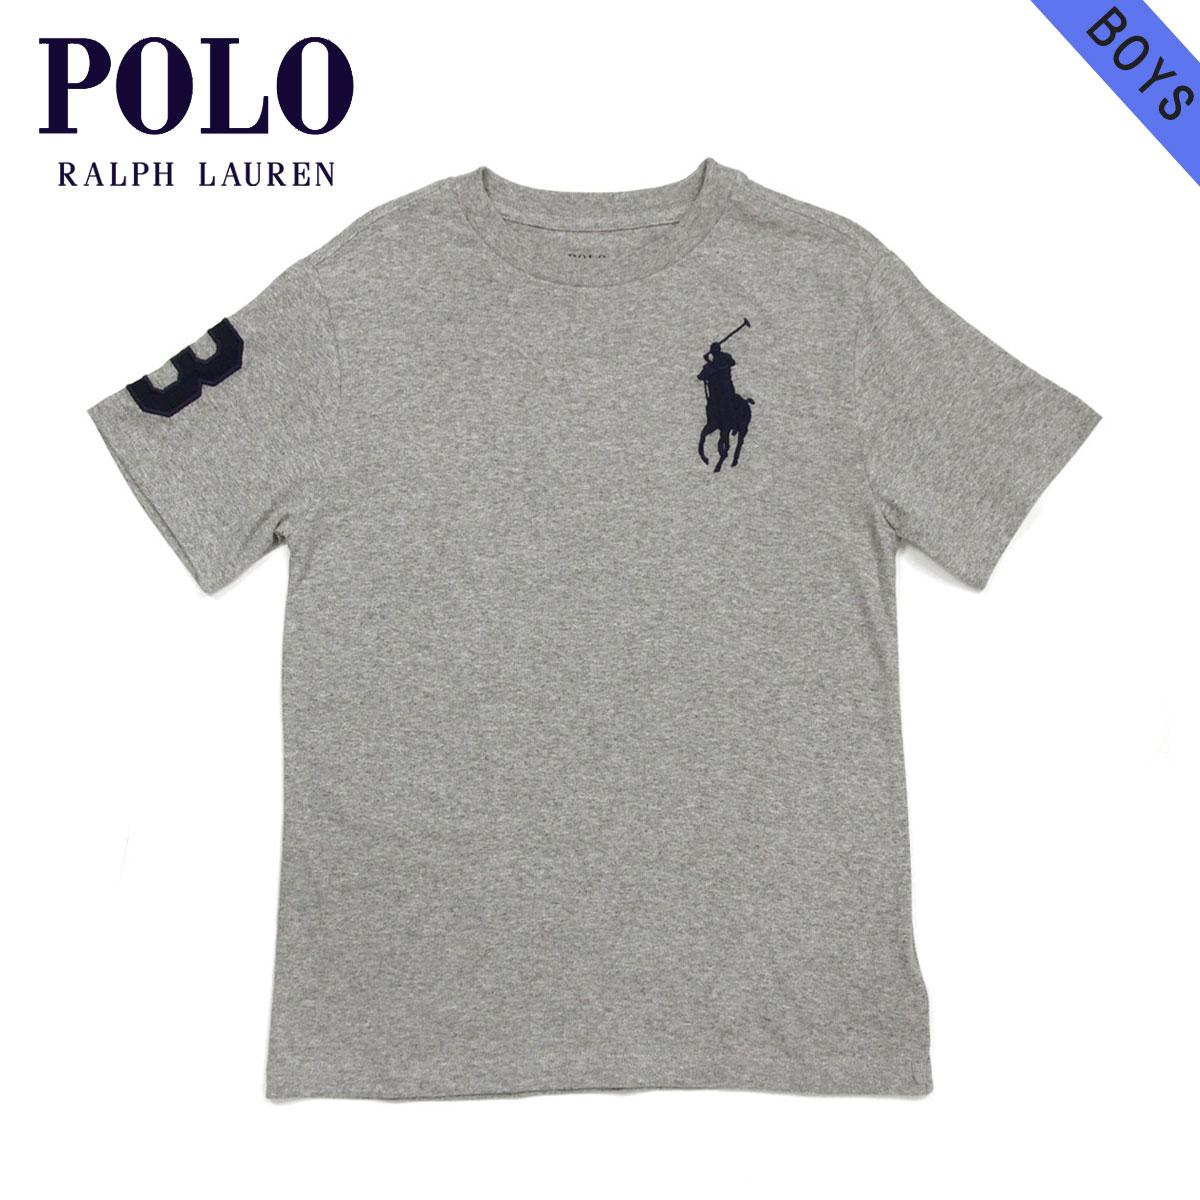 1152c8106406d Rakuten Ichiba shop MIXON  Polo Ralph Lauren kids POLO RALPH LAUREN CHILDREN  regular article children s clothes Boys big pony short sleeves T-shirt BIG  PONY ...